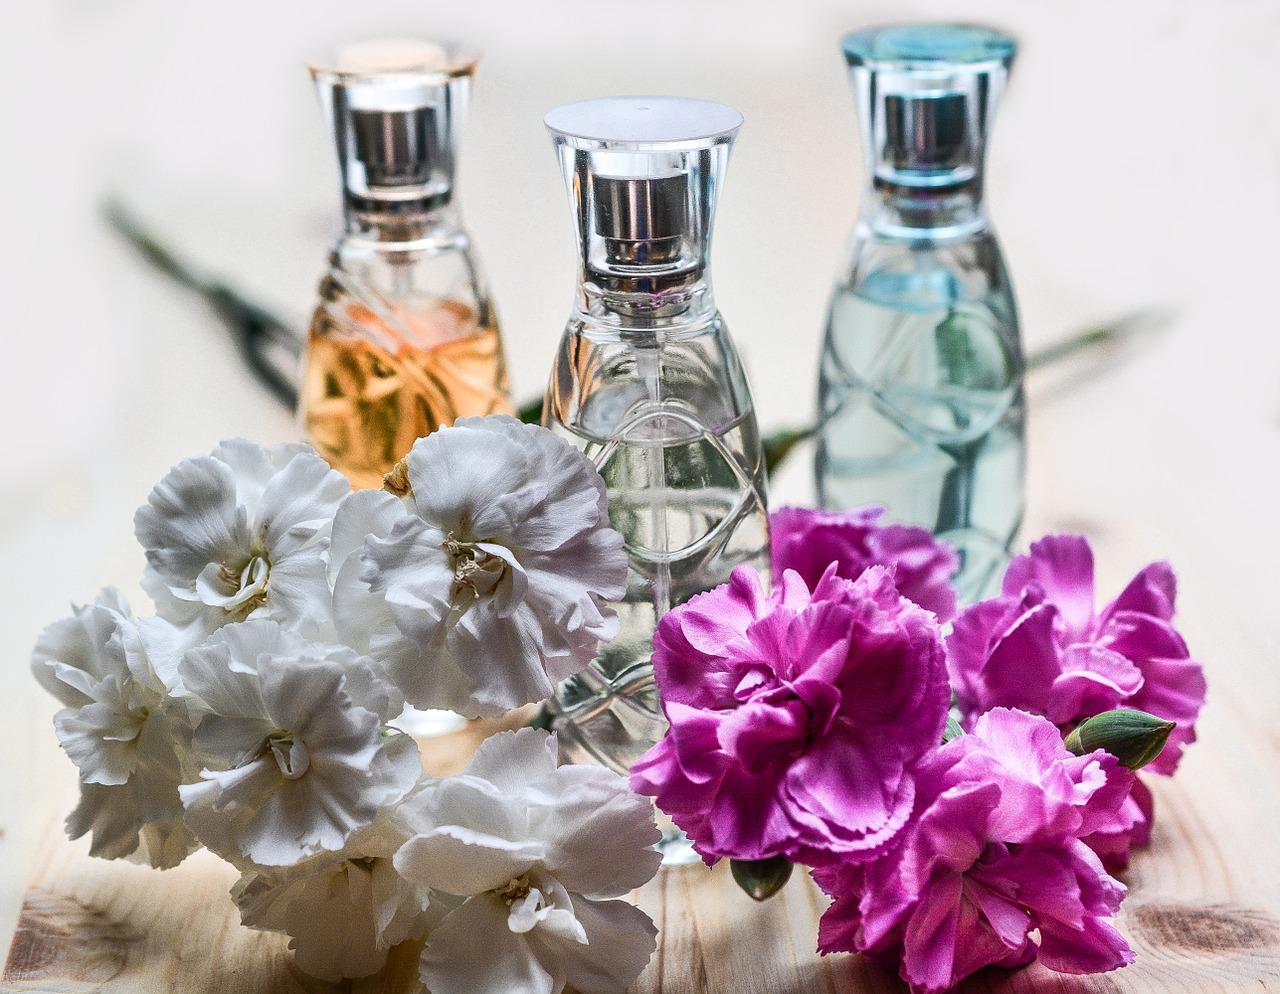 perfume-1433654_1280.jpg